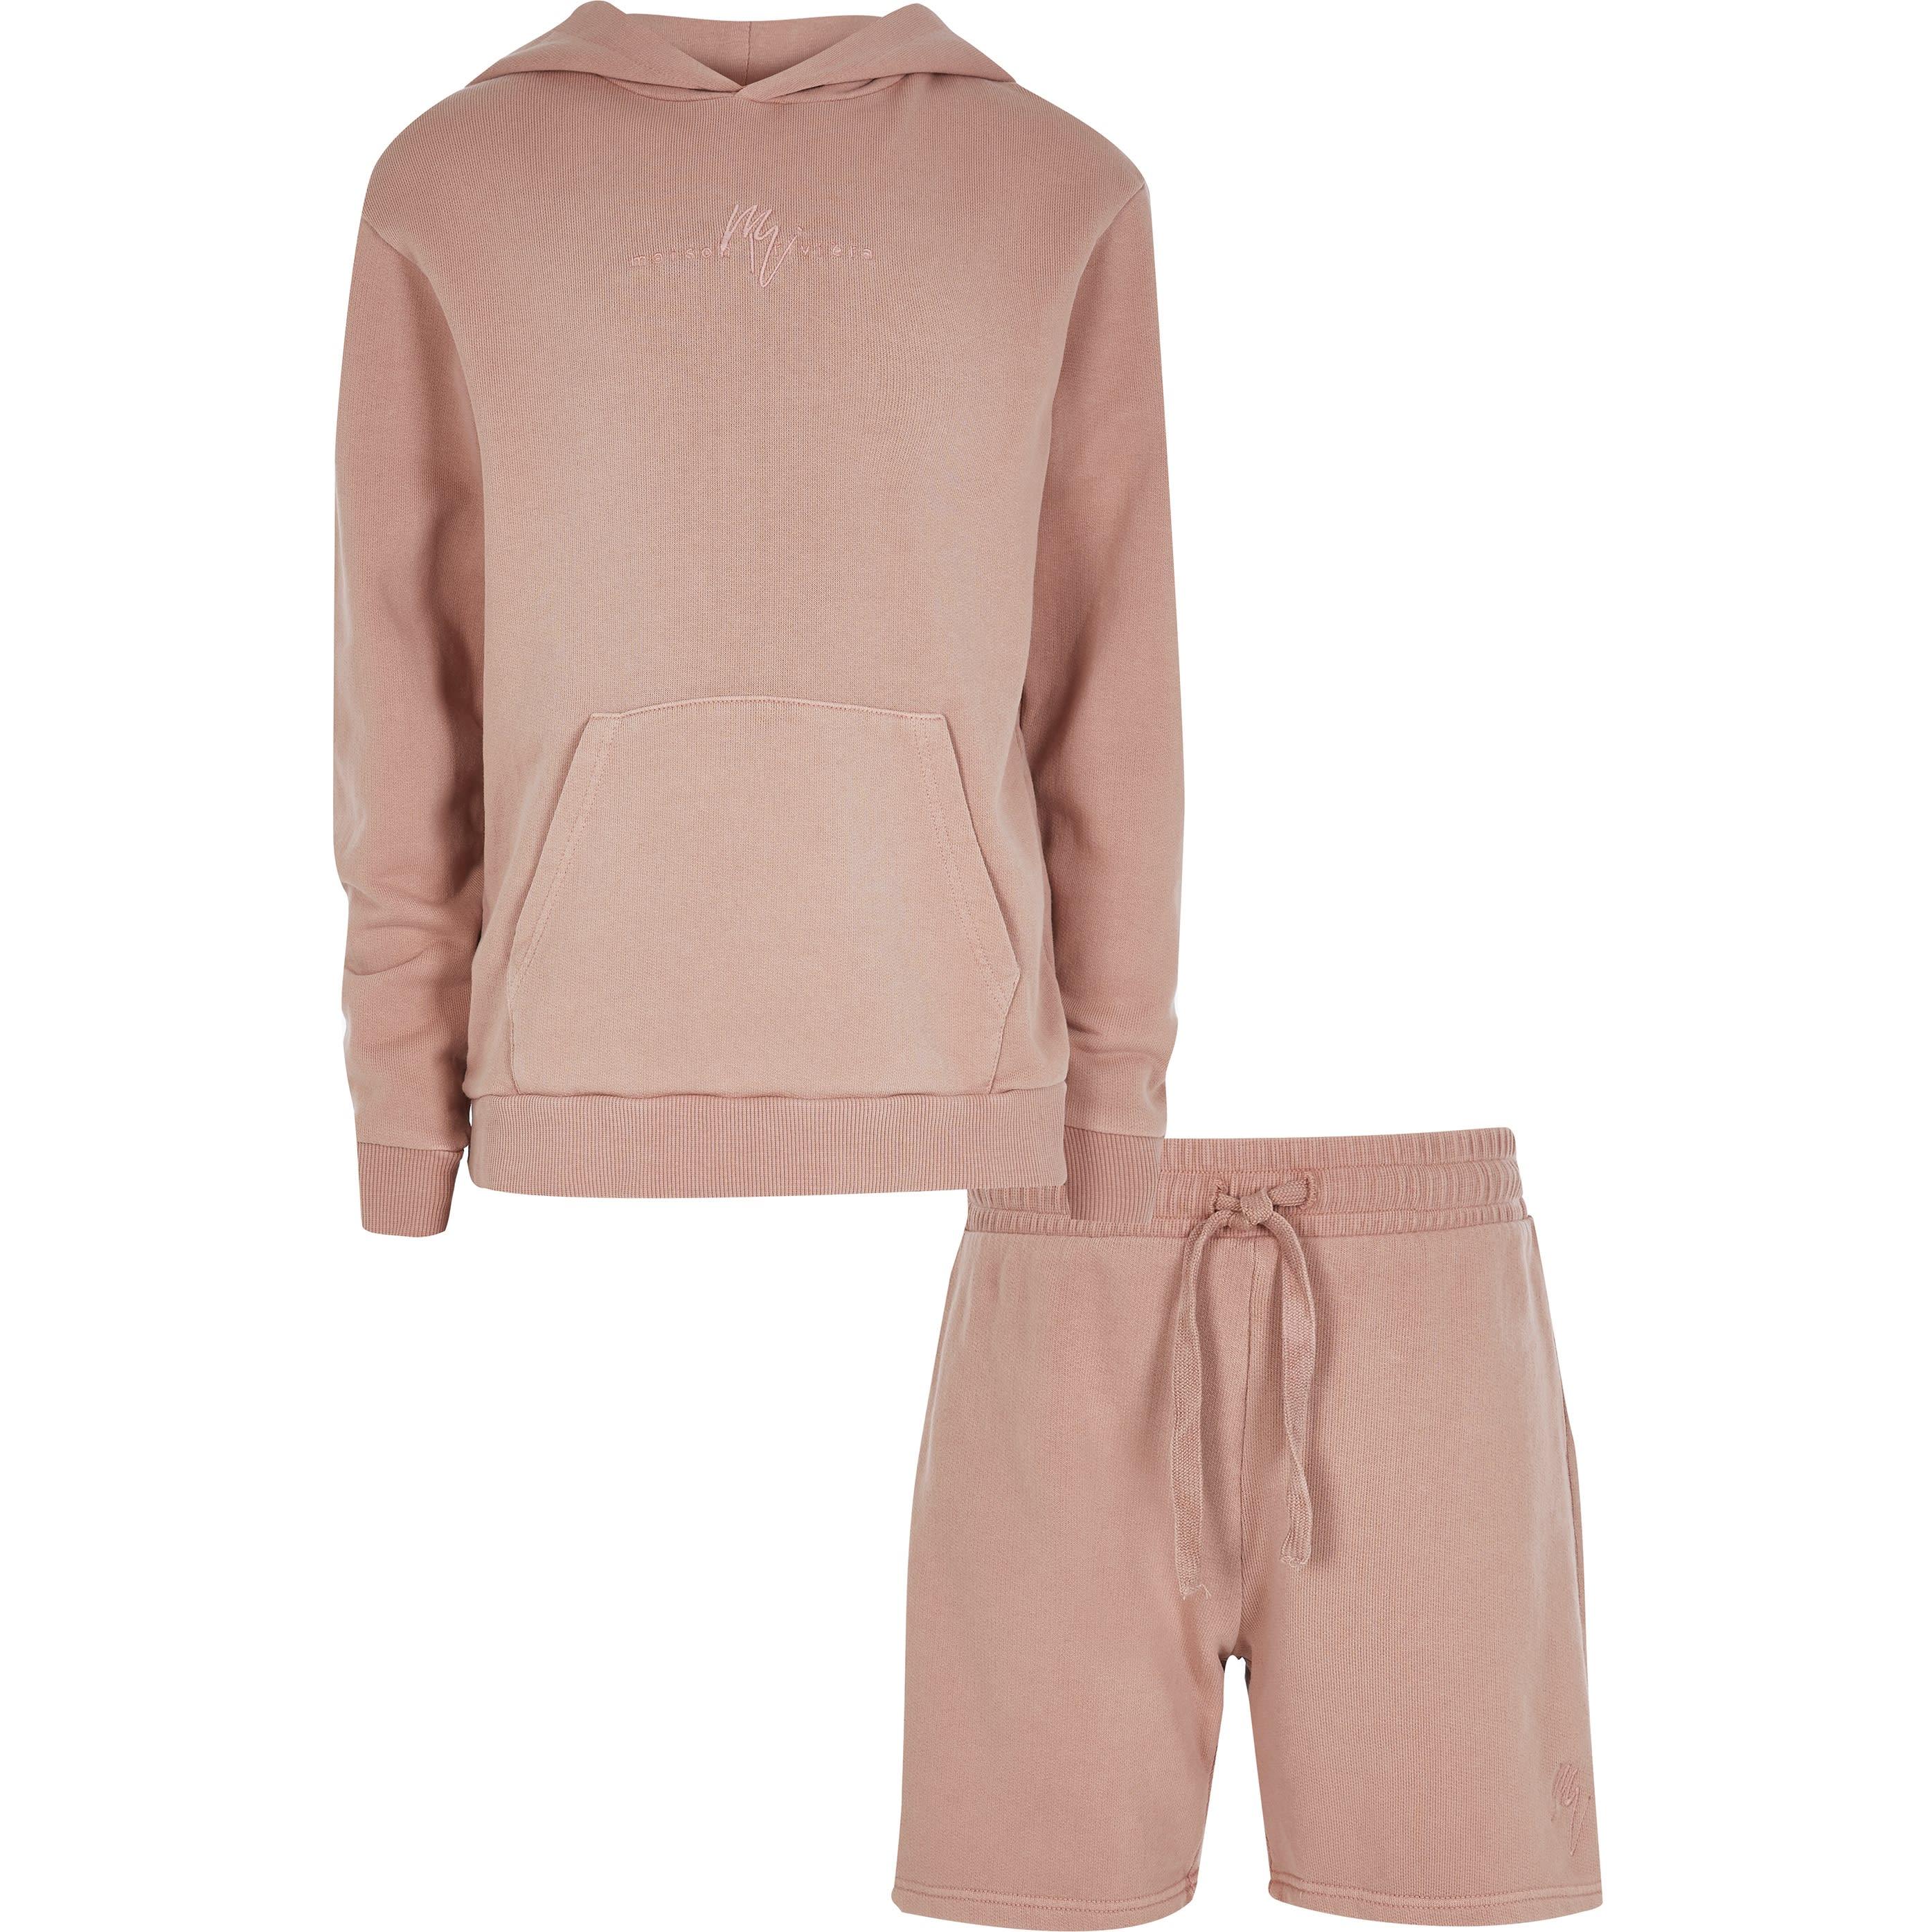 river island Boys Pink washed Hoody Set (7-8 Yrs)